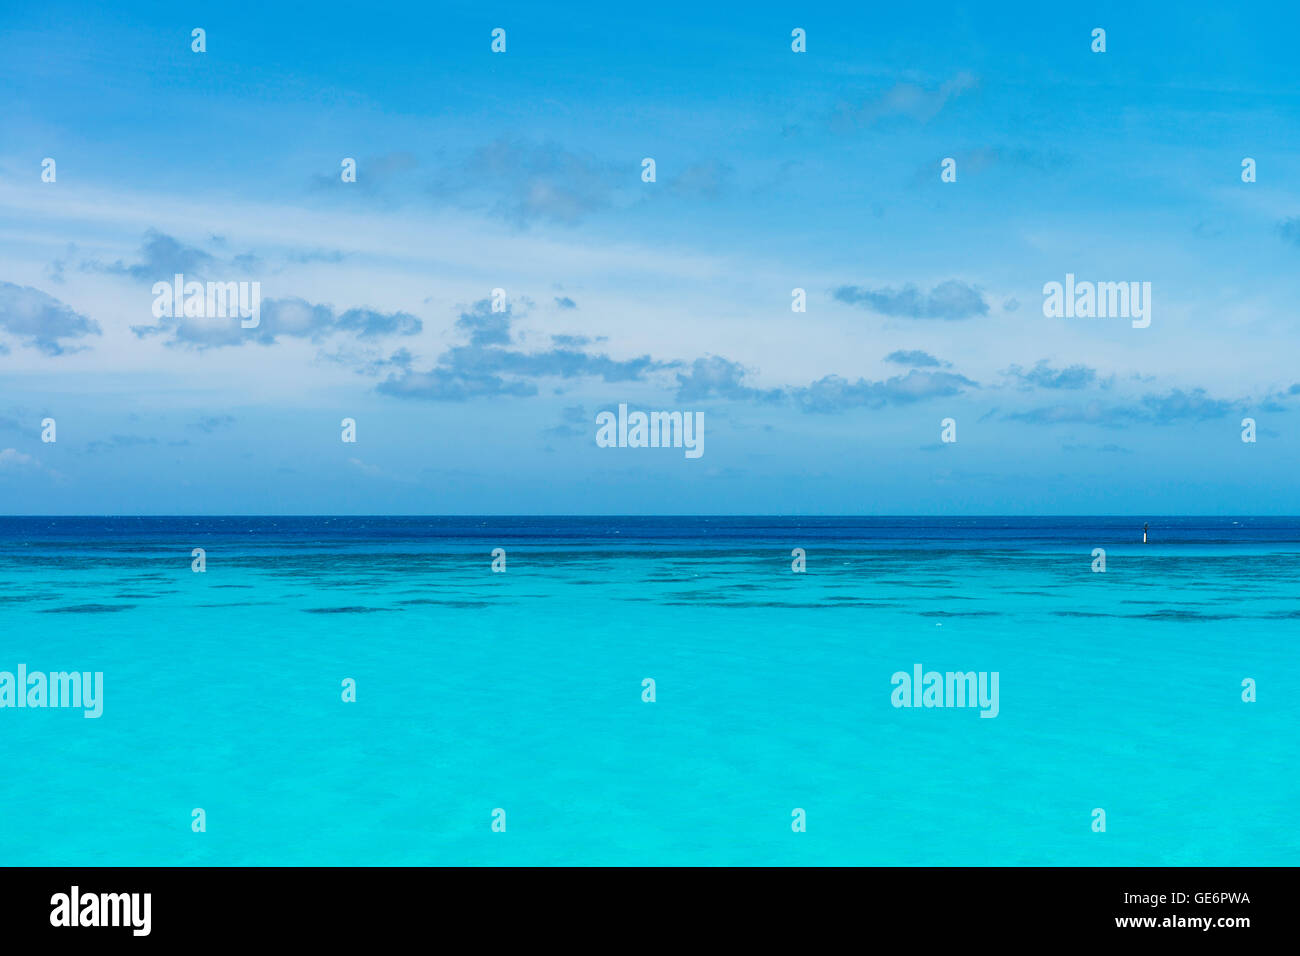 Azure ocean view from Whale Bay Park, Southampton Parish, Bermuda. - Stock Image